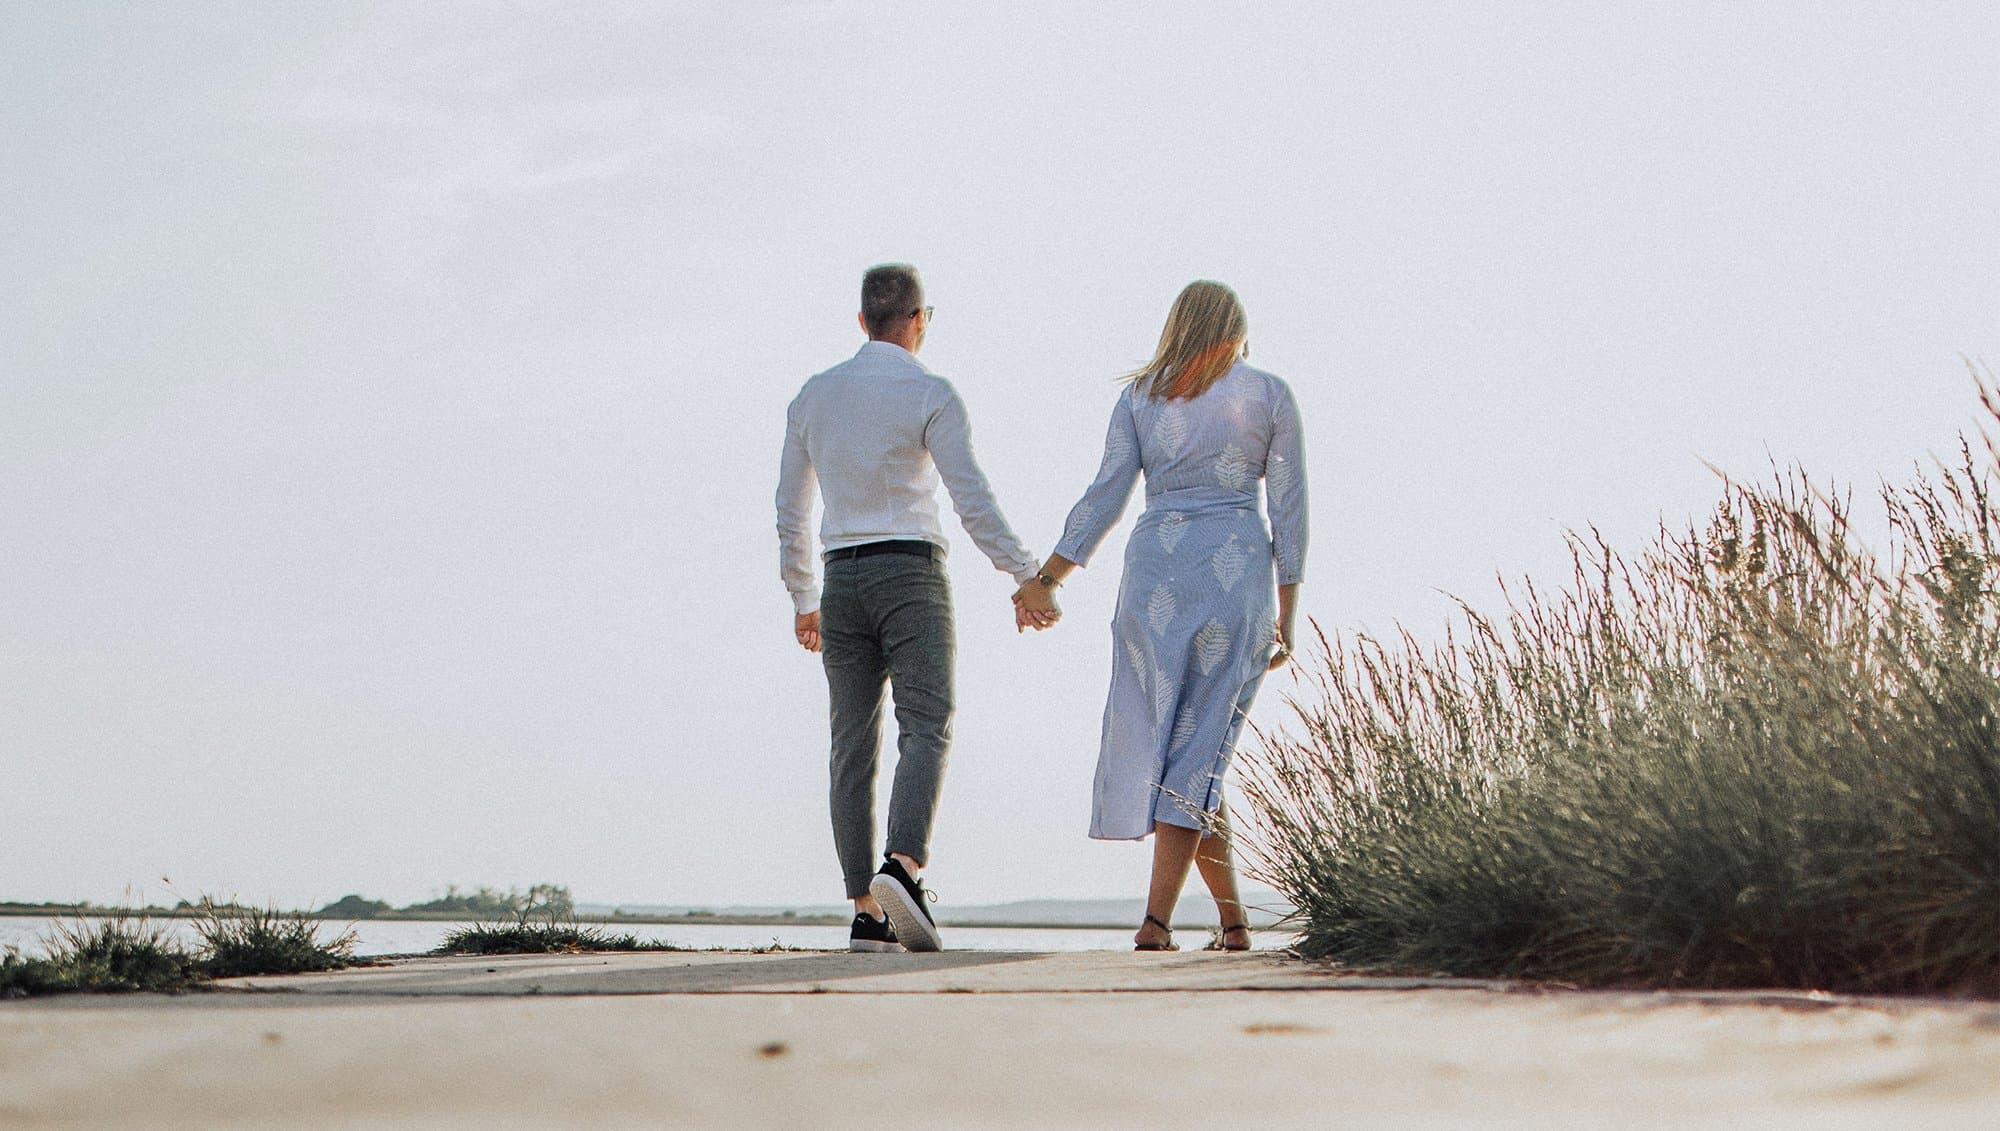 Couple holding hands walking along a beach.